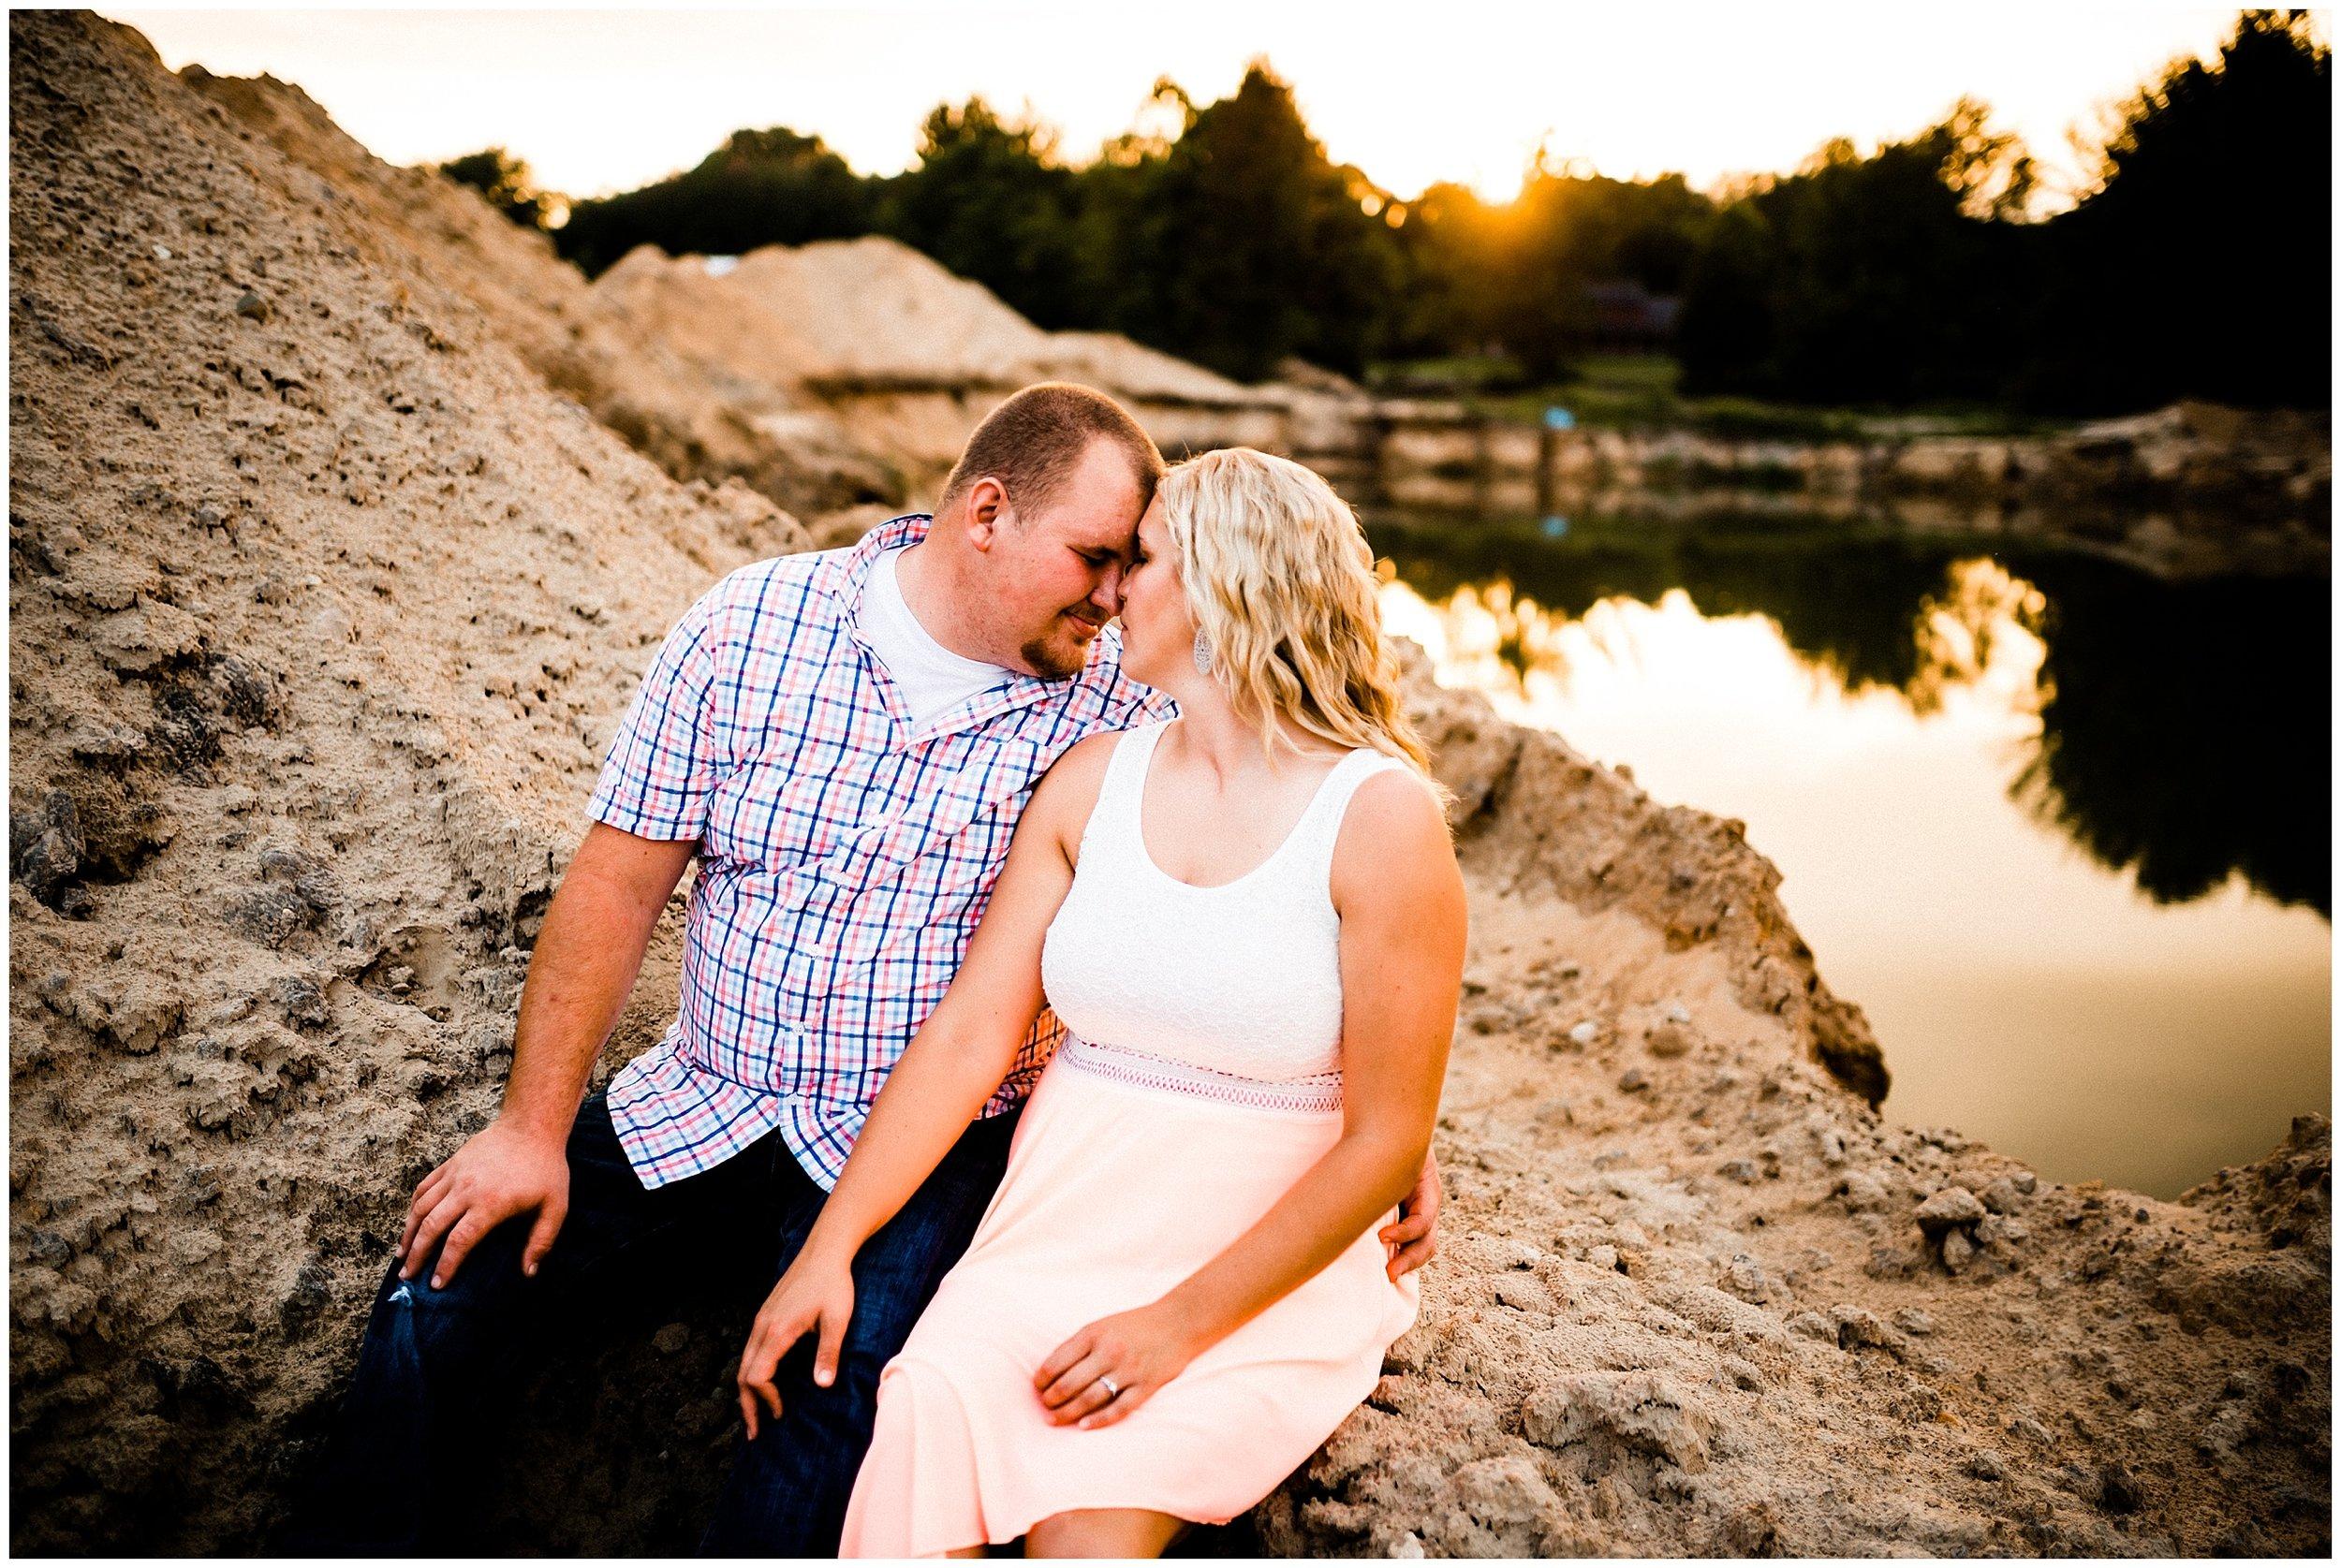 Nate + Tamryn | Engaged #kyleepaigephotography_1045.jpg